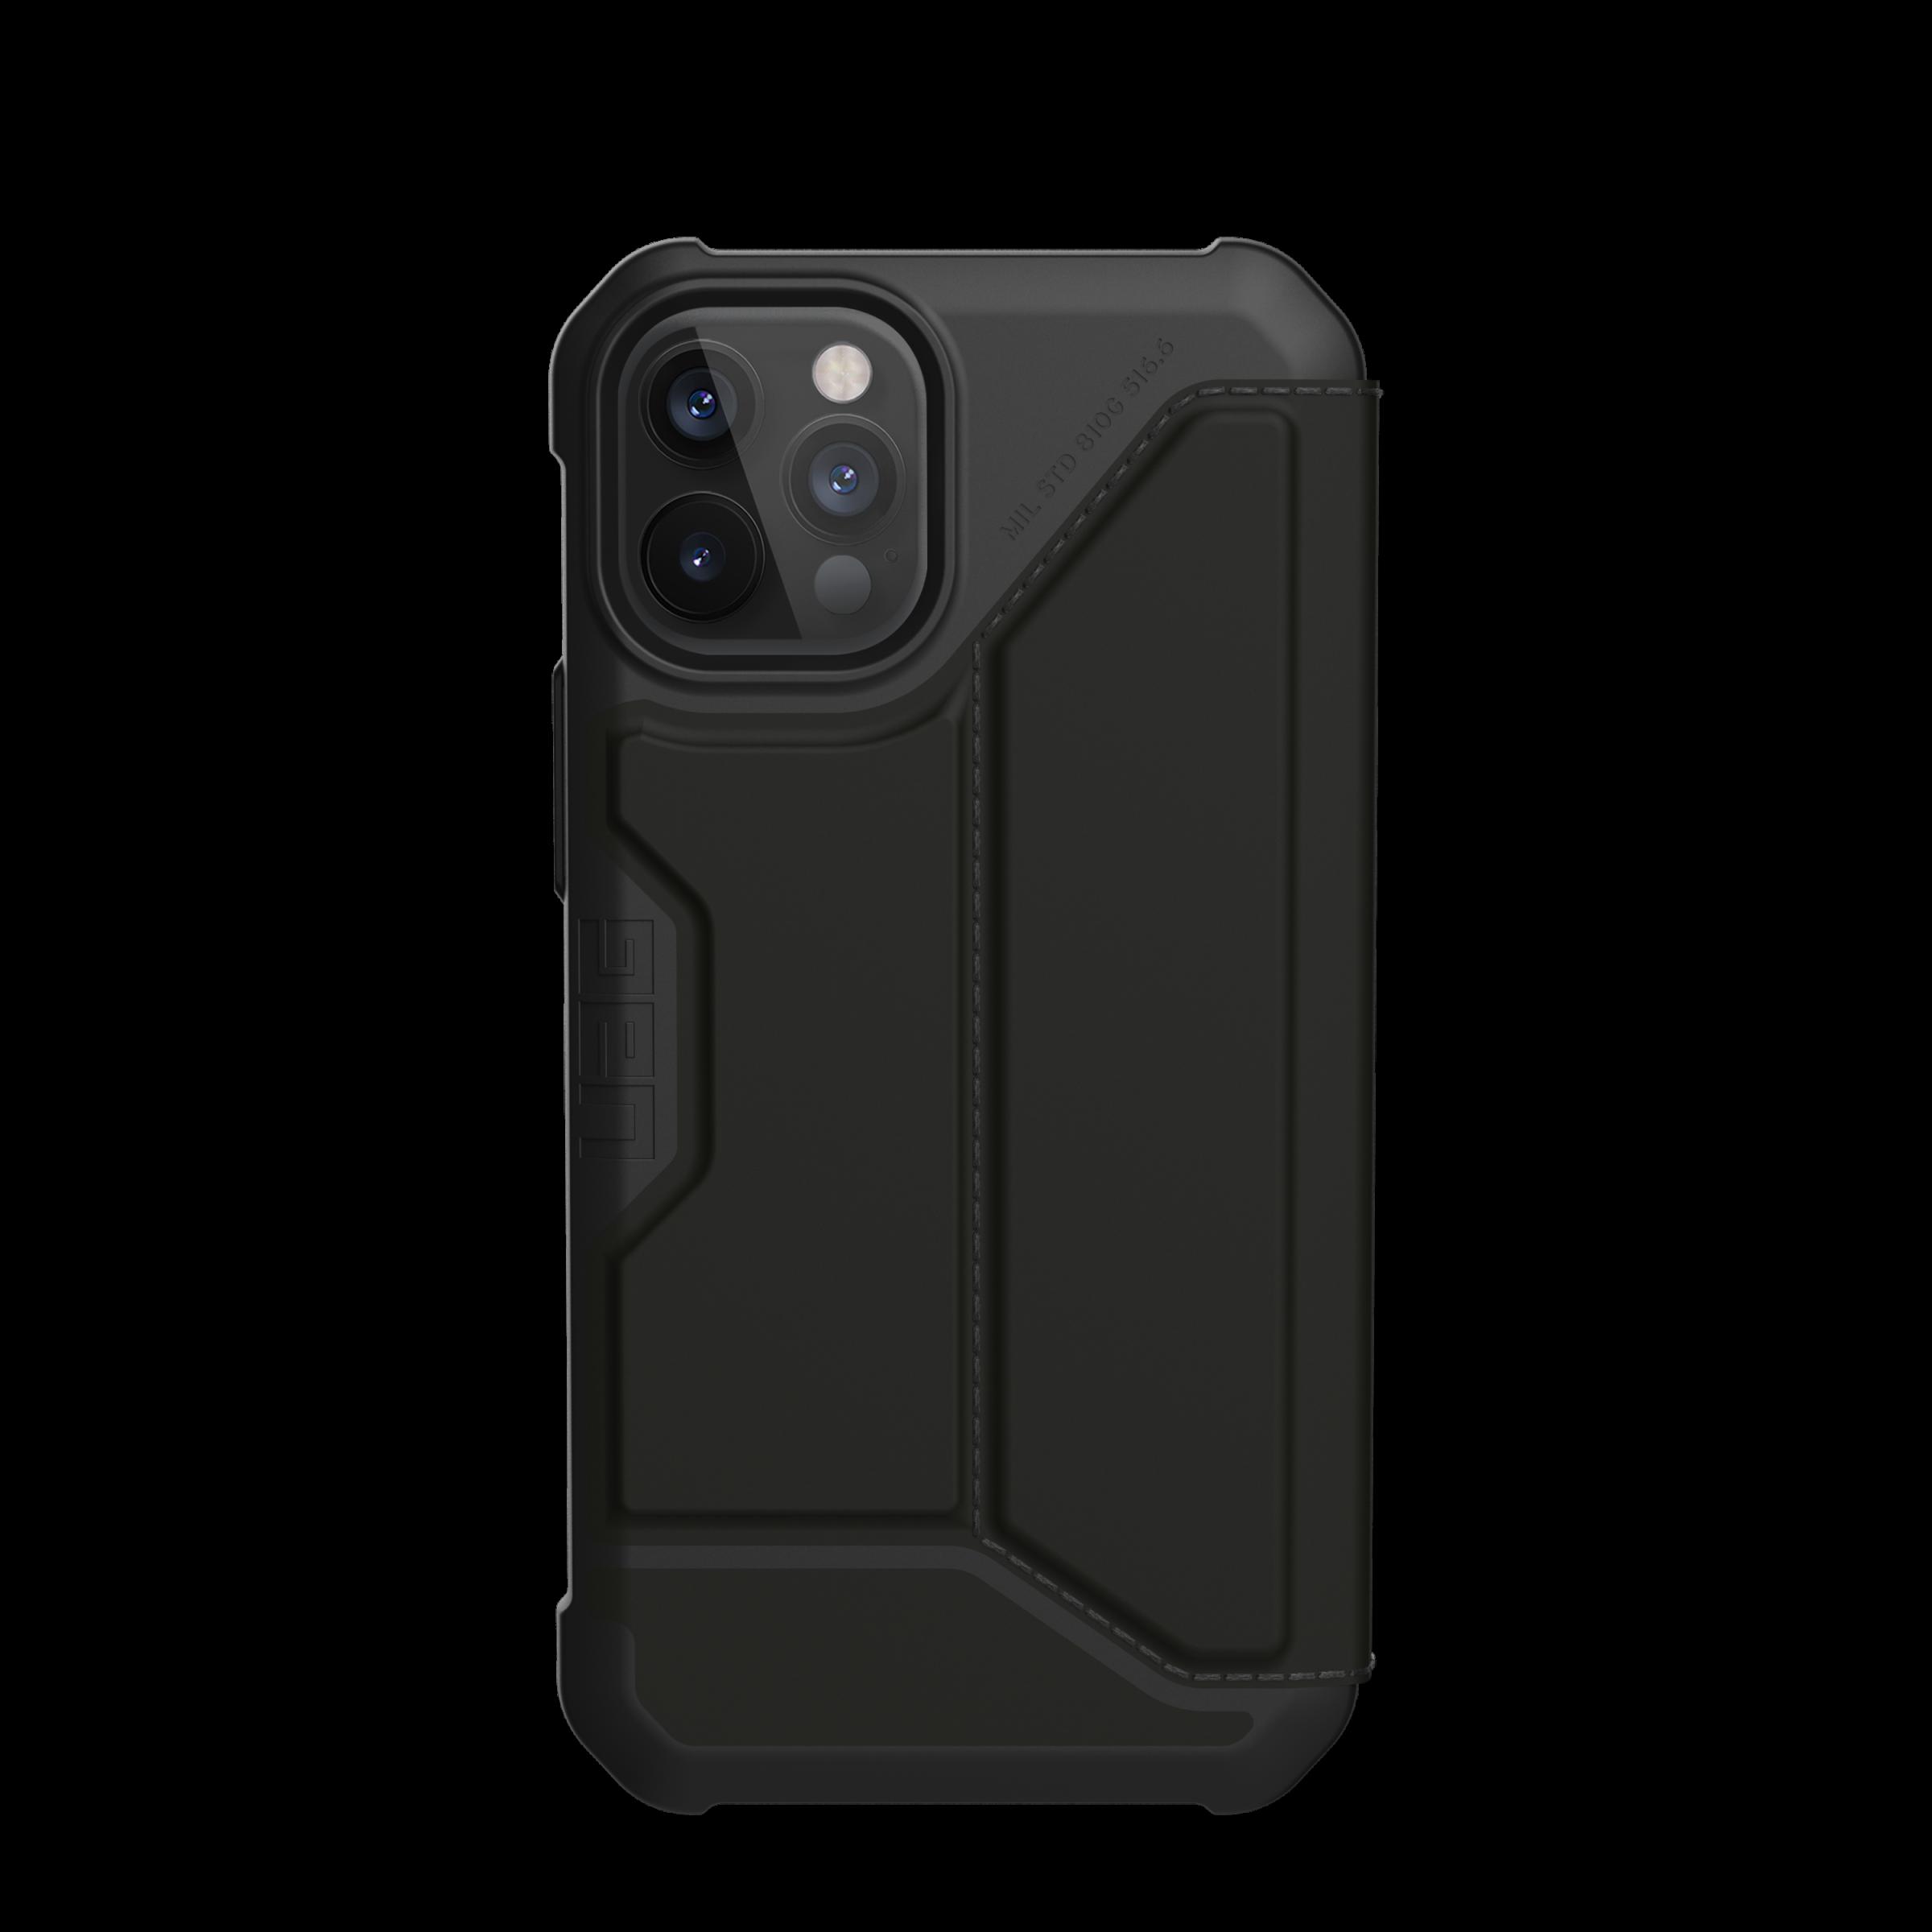 Metropolis Wallet Case iPhone 12 Pro Max Satin Black